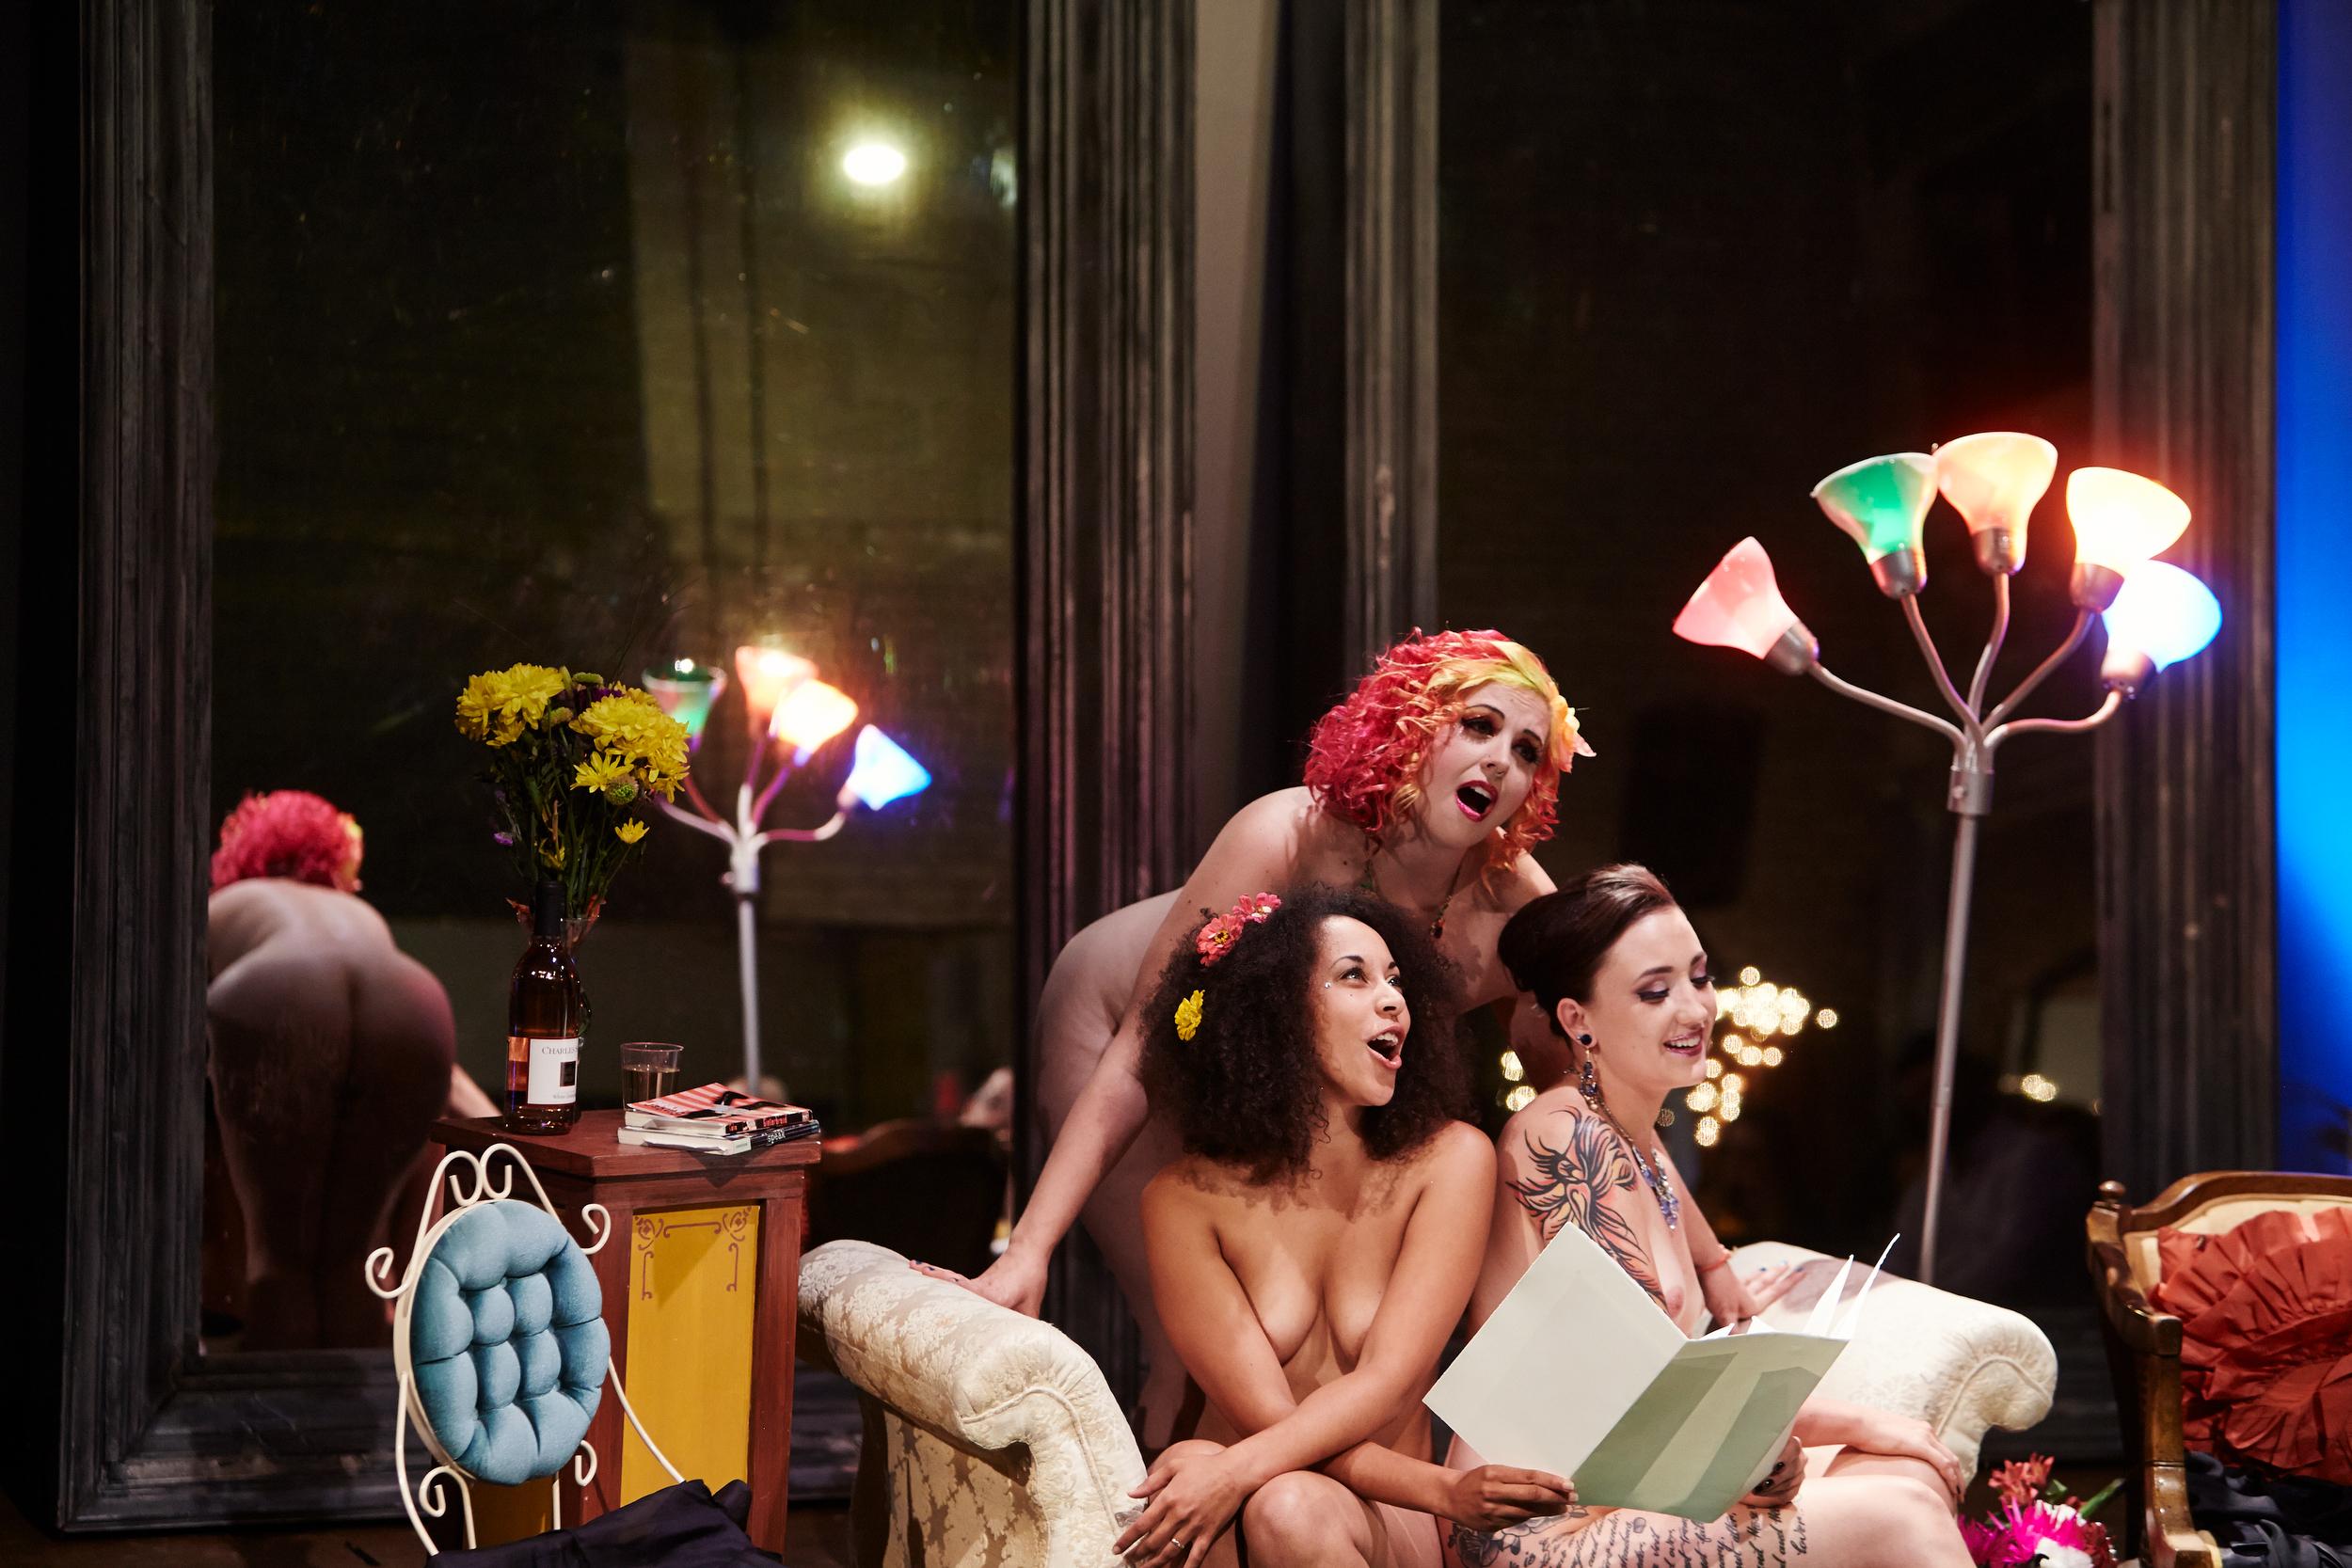 Nude girls social club